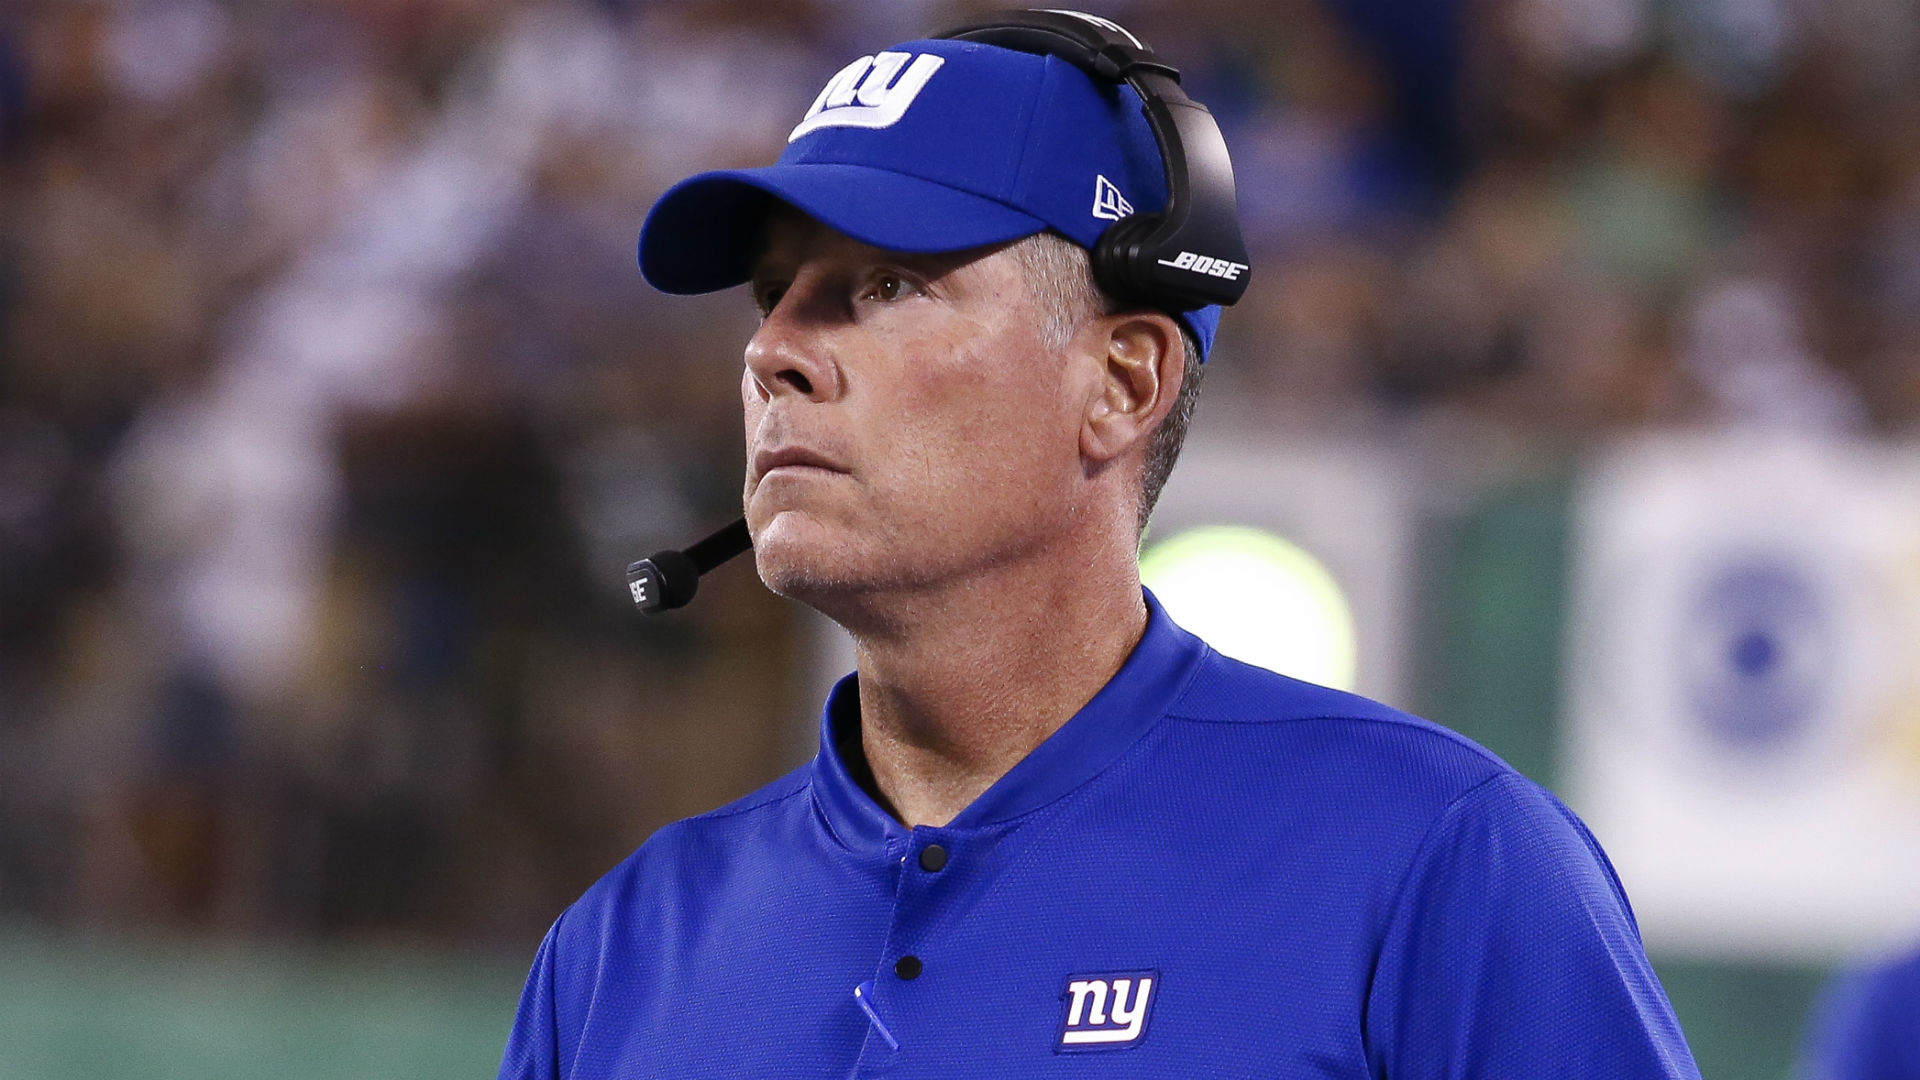 Andy Reid's coaching tree: Sean McDermott, John Harbaugh lead list of NFL success stories 7